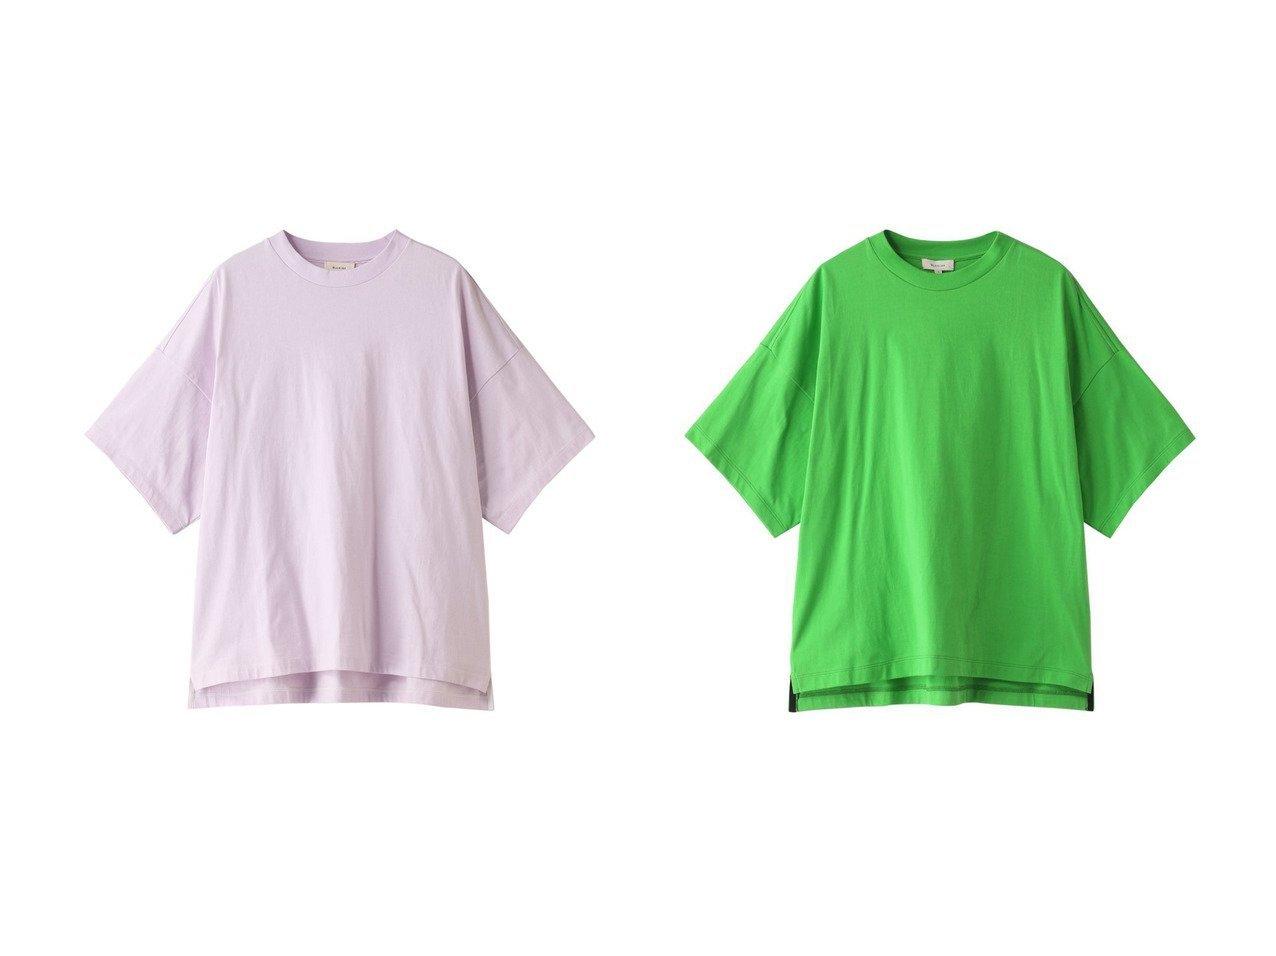 【BLAMINK/ブラミンク】のコットンクルーネックオーバースリーブTシャツ 【トップス・カットソー】おすすめ!人気、トレンド・レディースファッションの通販  おすすめで人気の流行・トレンド、ファッションの通販商品 メンズファッション・キッズファッション・インテリア・家具・レディースファッション・服の通販 founy(ファニー) https://founy.com/ ファッション Fashion レディースファッション WOMEN トップス・カットソー Tops/Tshirt シャツ/ブラウス Shirts/Blouses ロング / Tシャツ T-Shirts カットソー Cut and Sewn 2021年 2021 2021春夏・S/S SS/Spring/Summer/2021 S/S・春夏 SS・Spring/Summer ショート シンプル スリーブ 半袖 春 Spring |ID:crp329100000027101